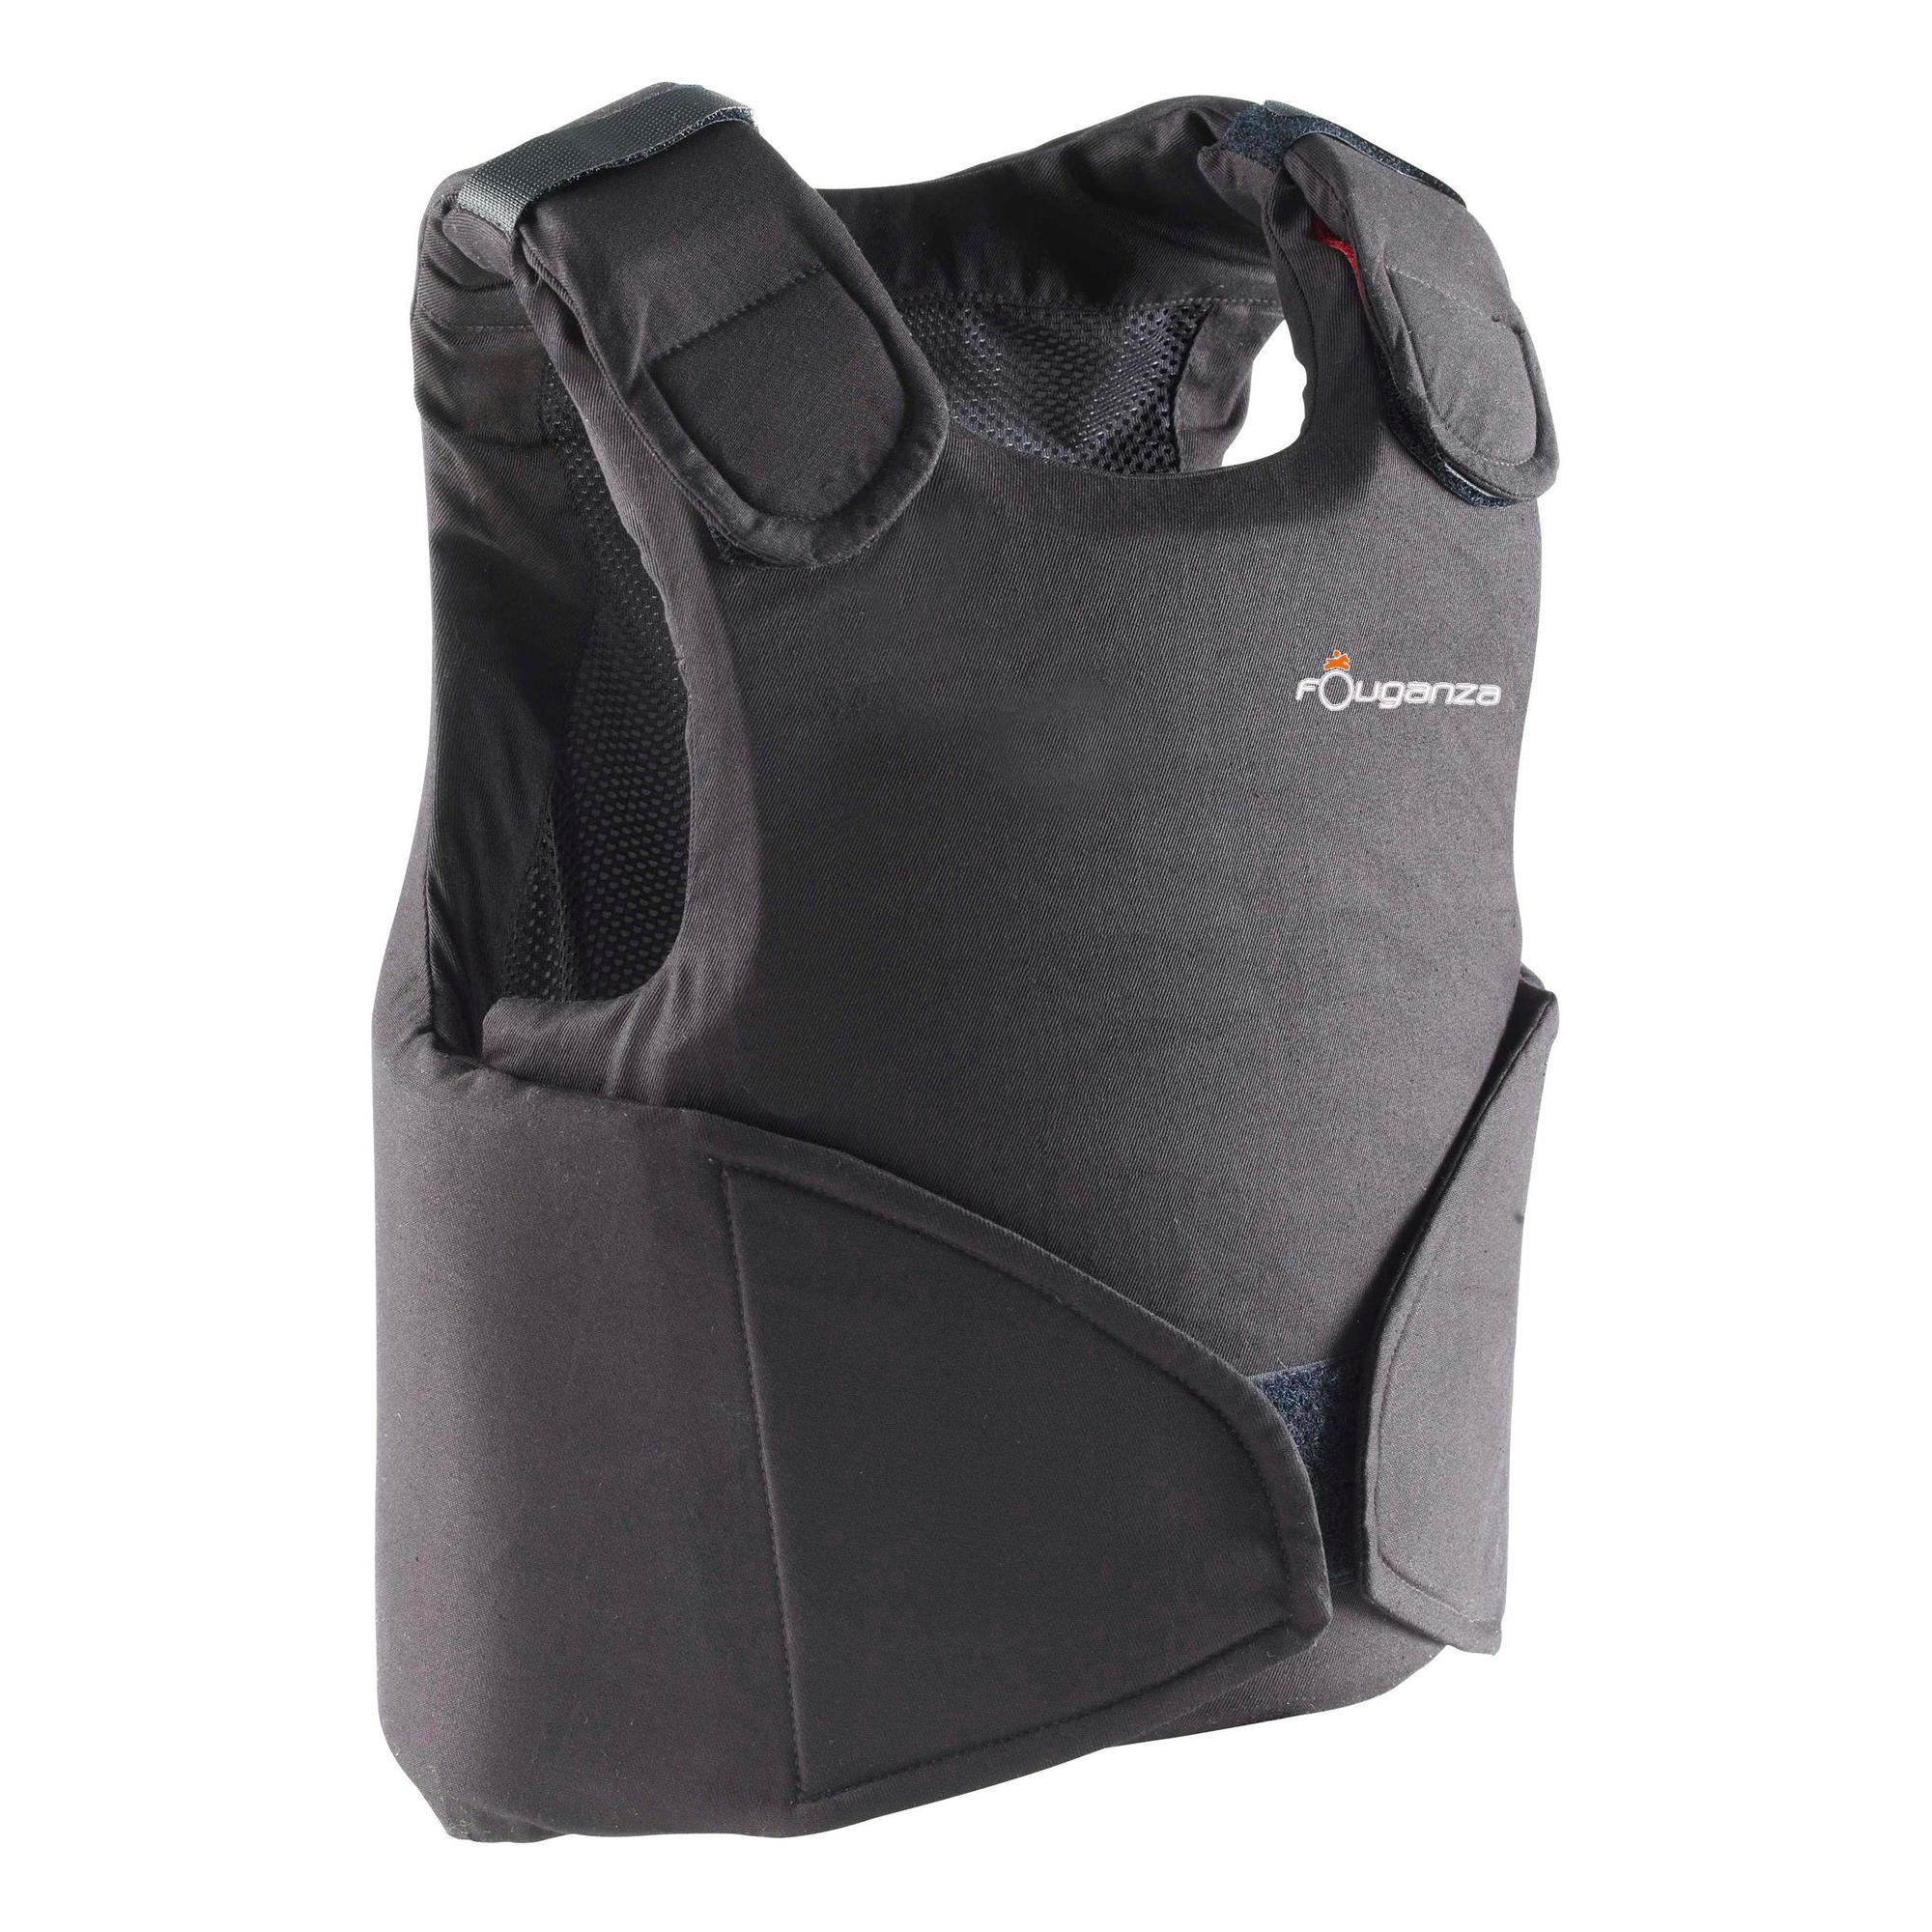 Fouganza Bodyprotector SAFETY 100 voor kinderen, ruitersport